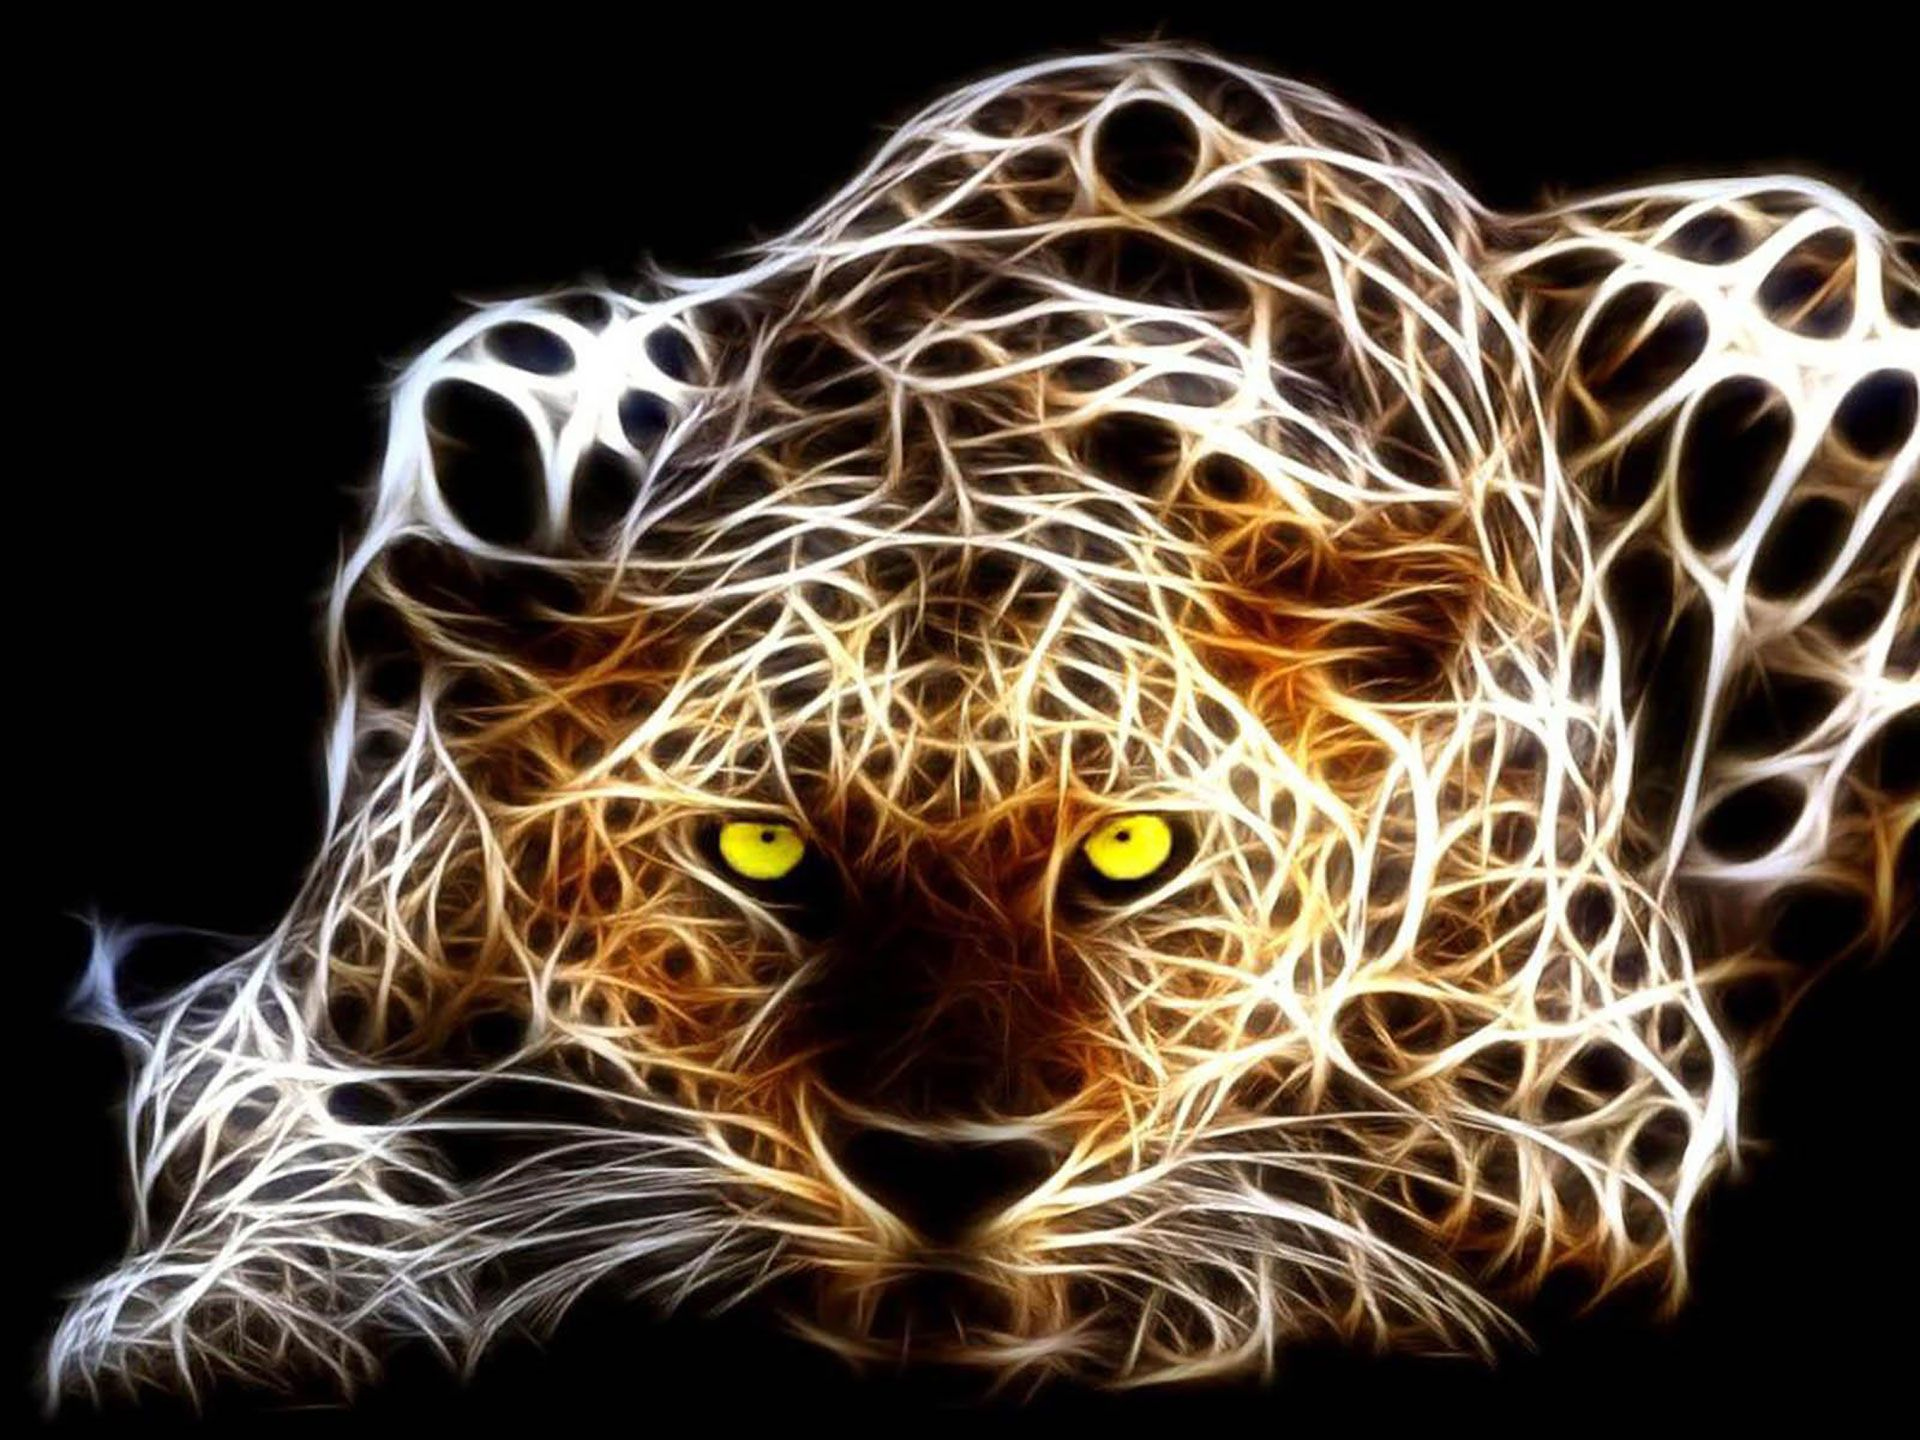 Best D Animal Wallpaper Hd Animated Animal Wallpaper Fondo De